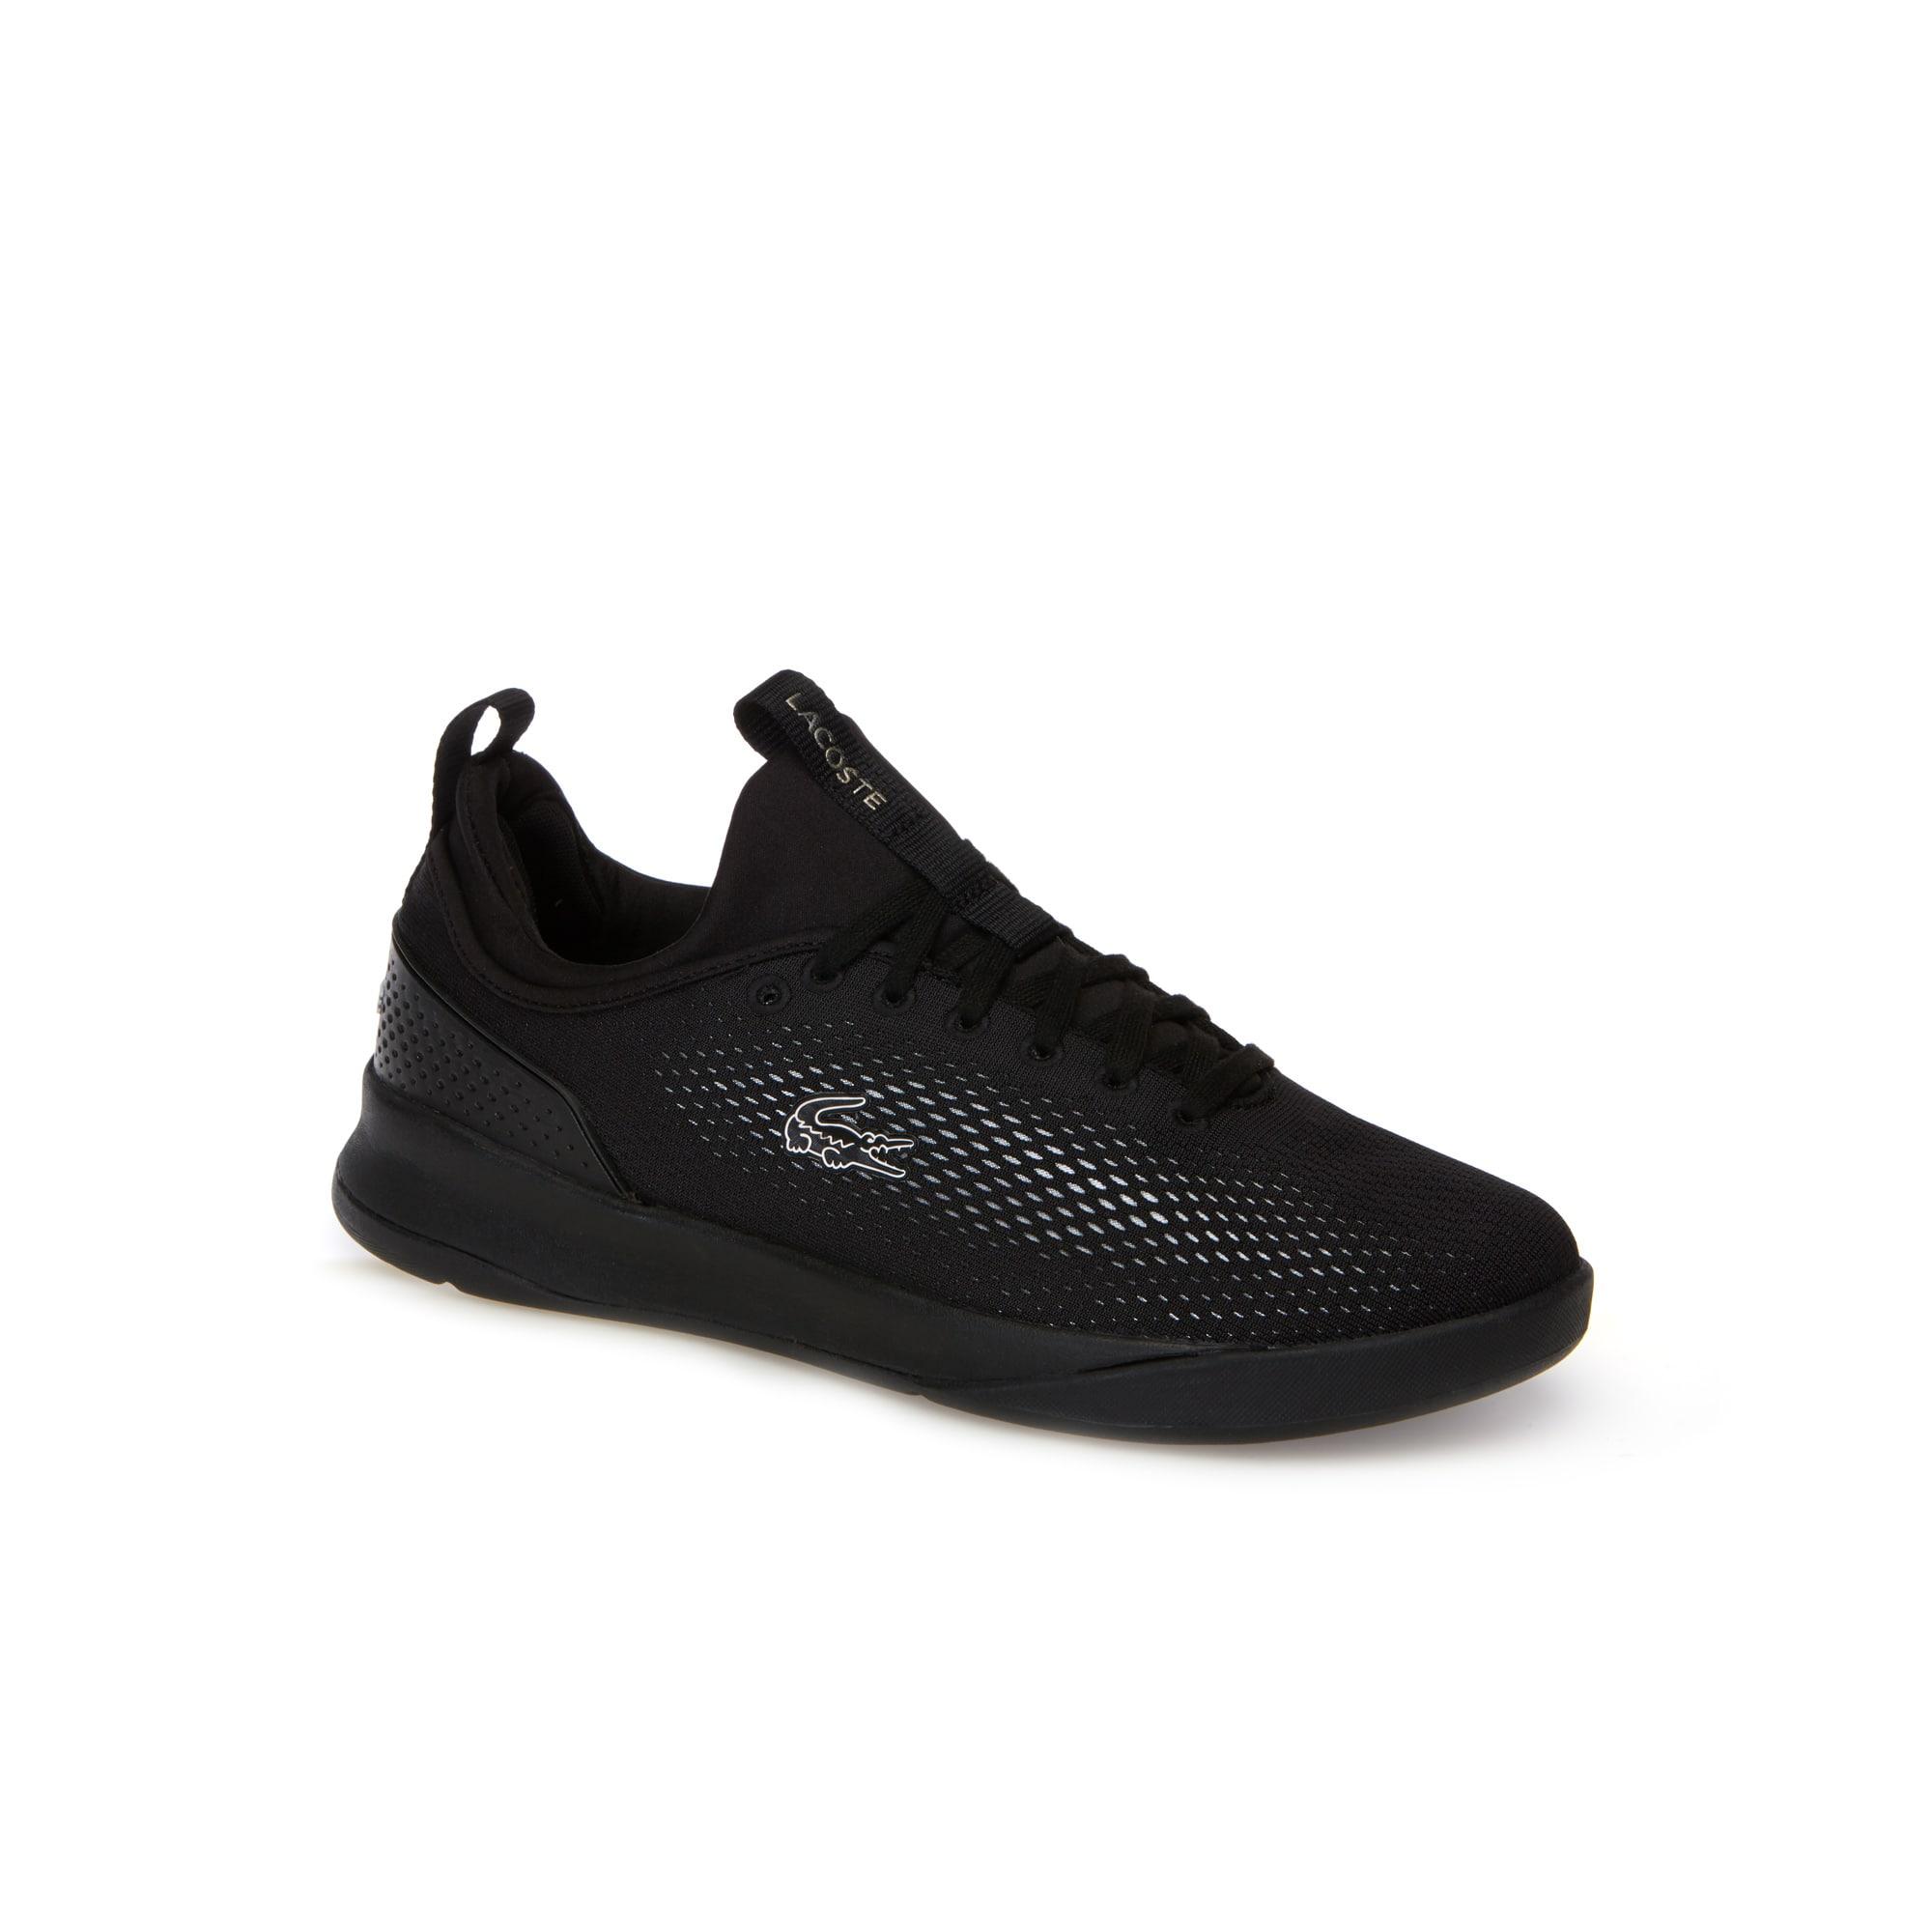 Zapatillas de hombre LT Spirit SPORT 2.0 de malla